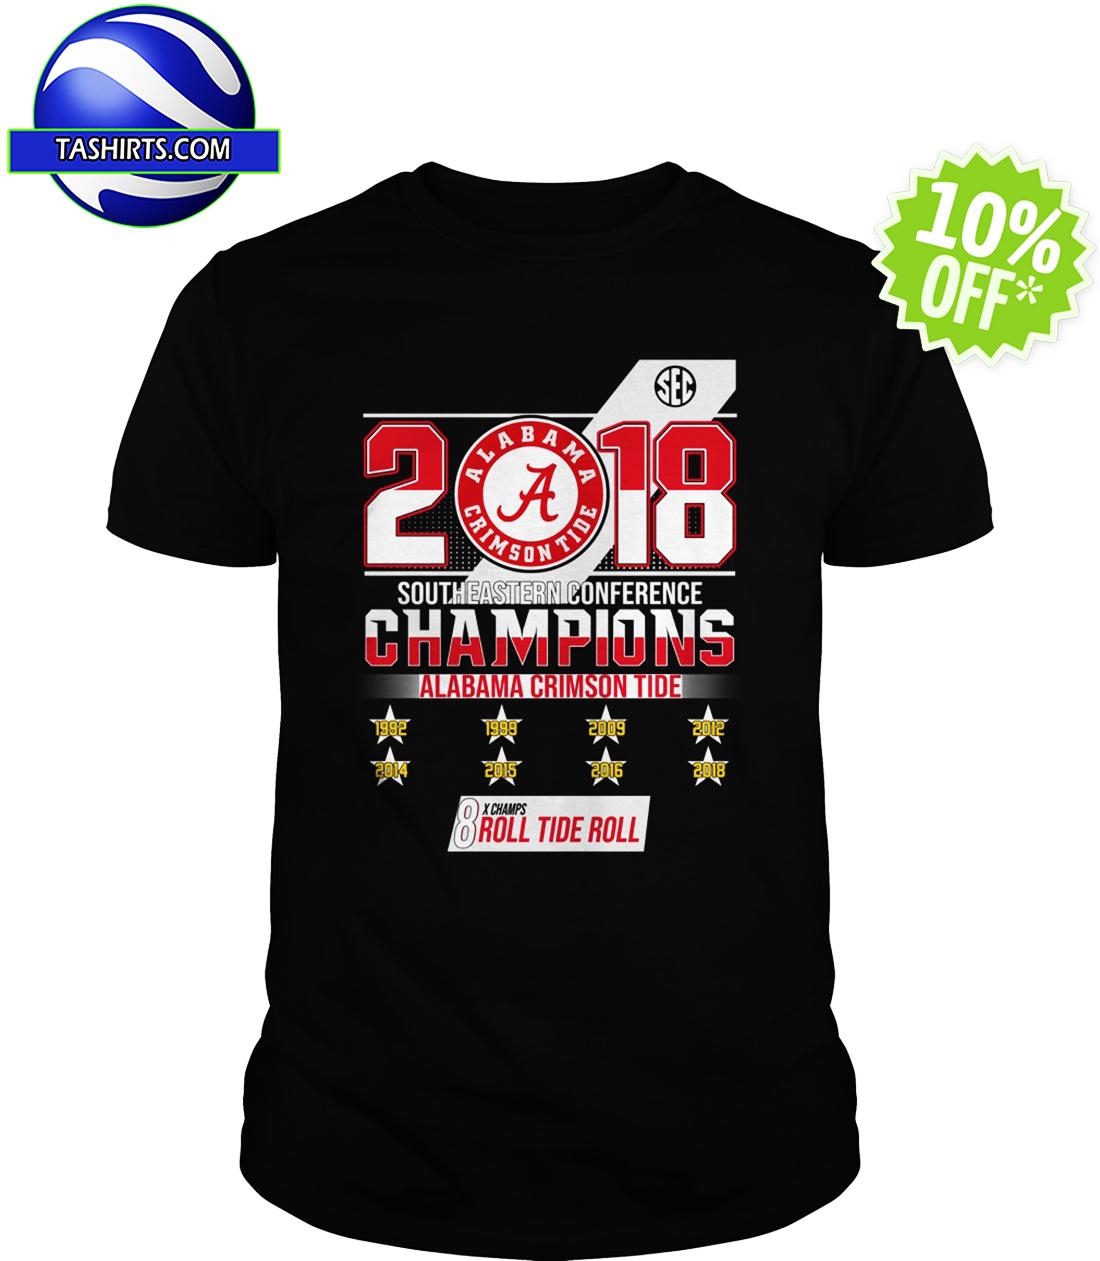 2018 Southeastern Conference Champions Alabama Crimson Tide shirt